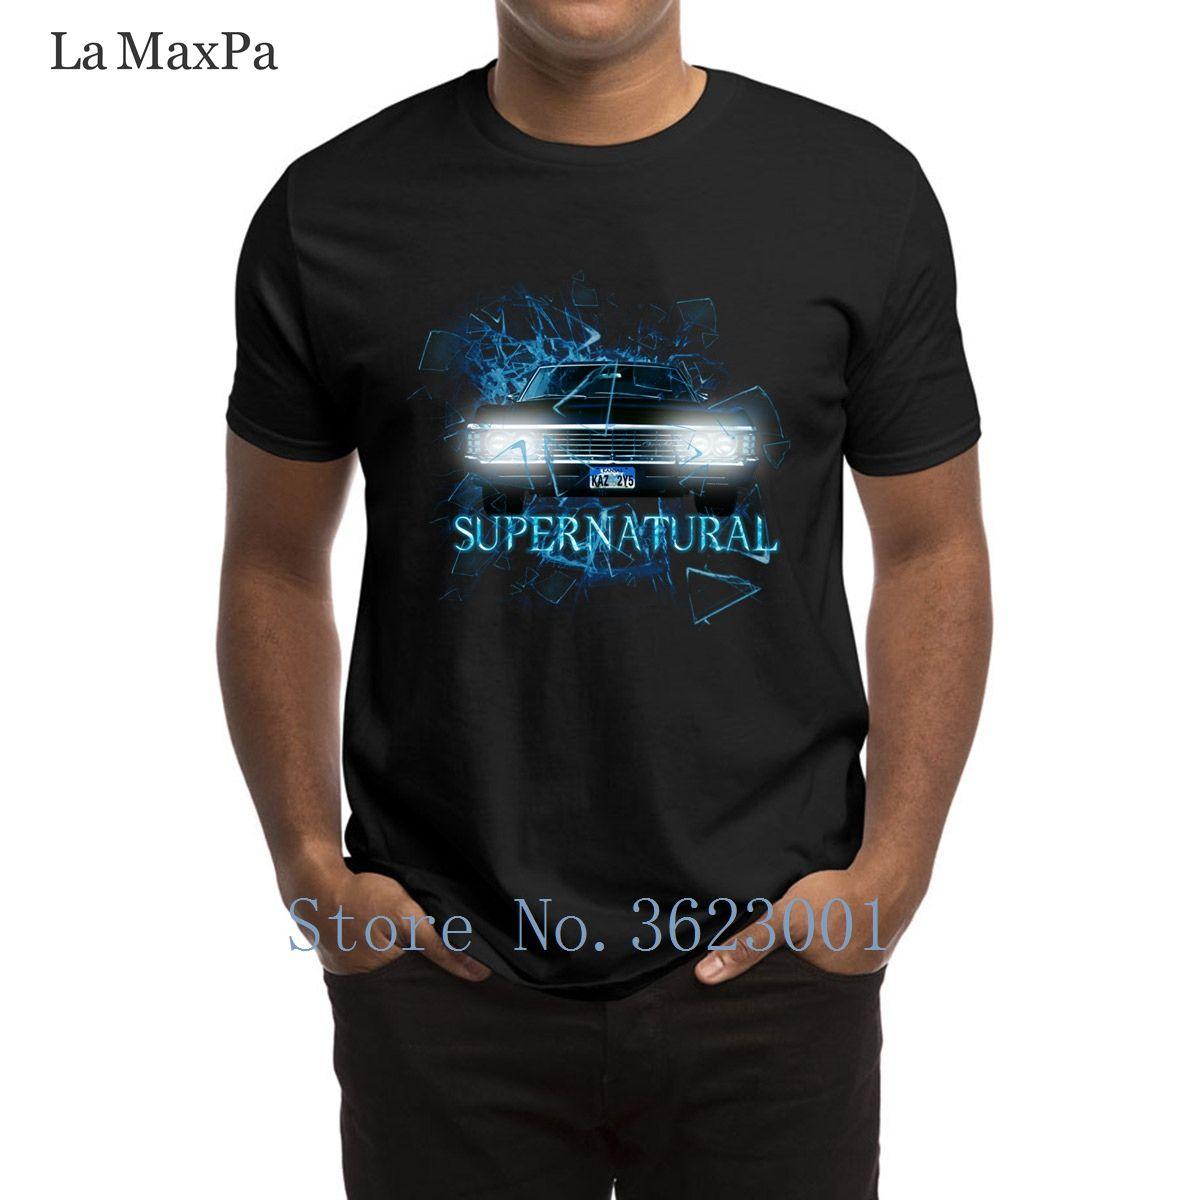 Tendencia Camiseta de encargo Supernatural Destruir Uninverse T camisa del traje Funky Camiseta Mejor manga corta camiseta linda